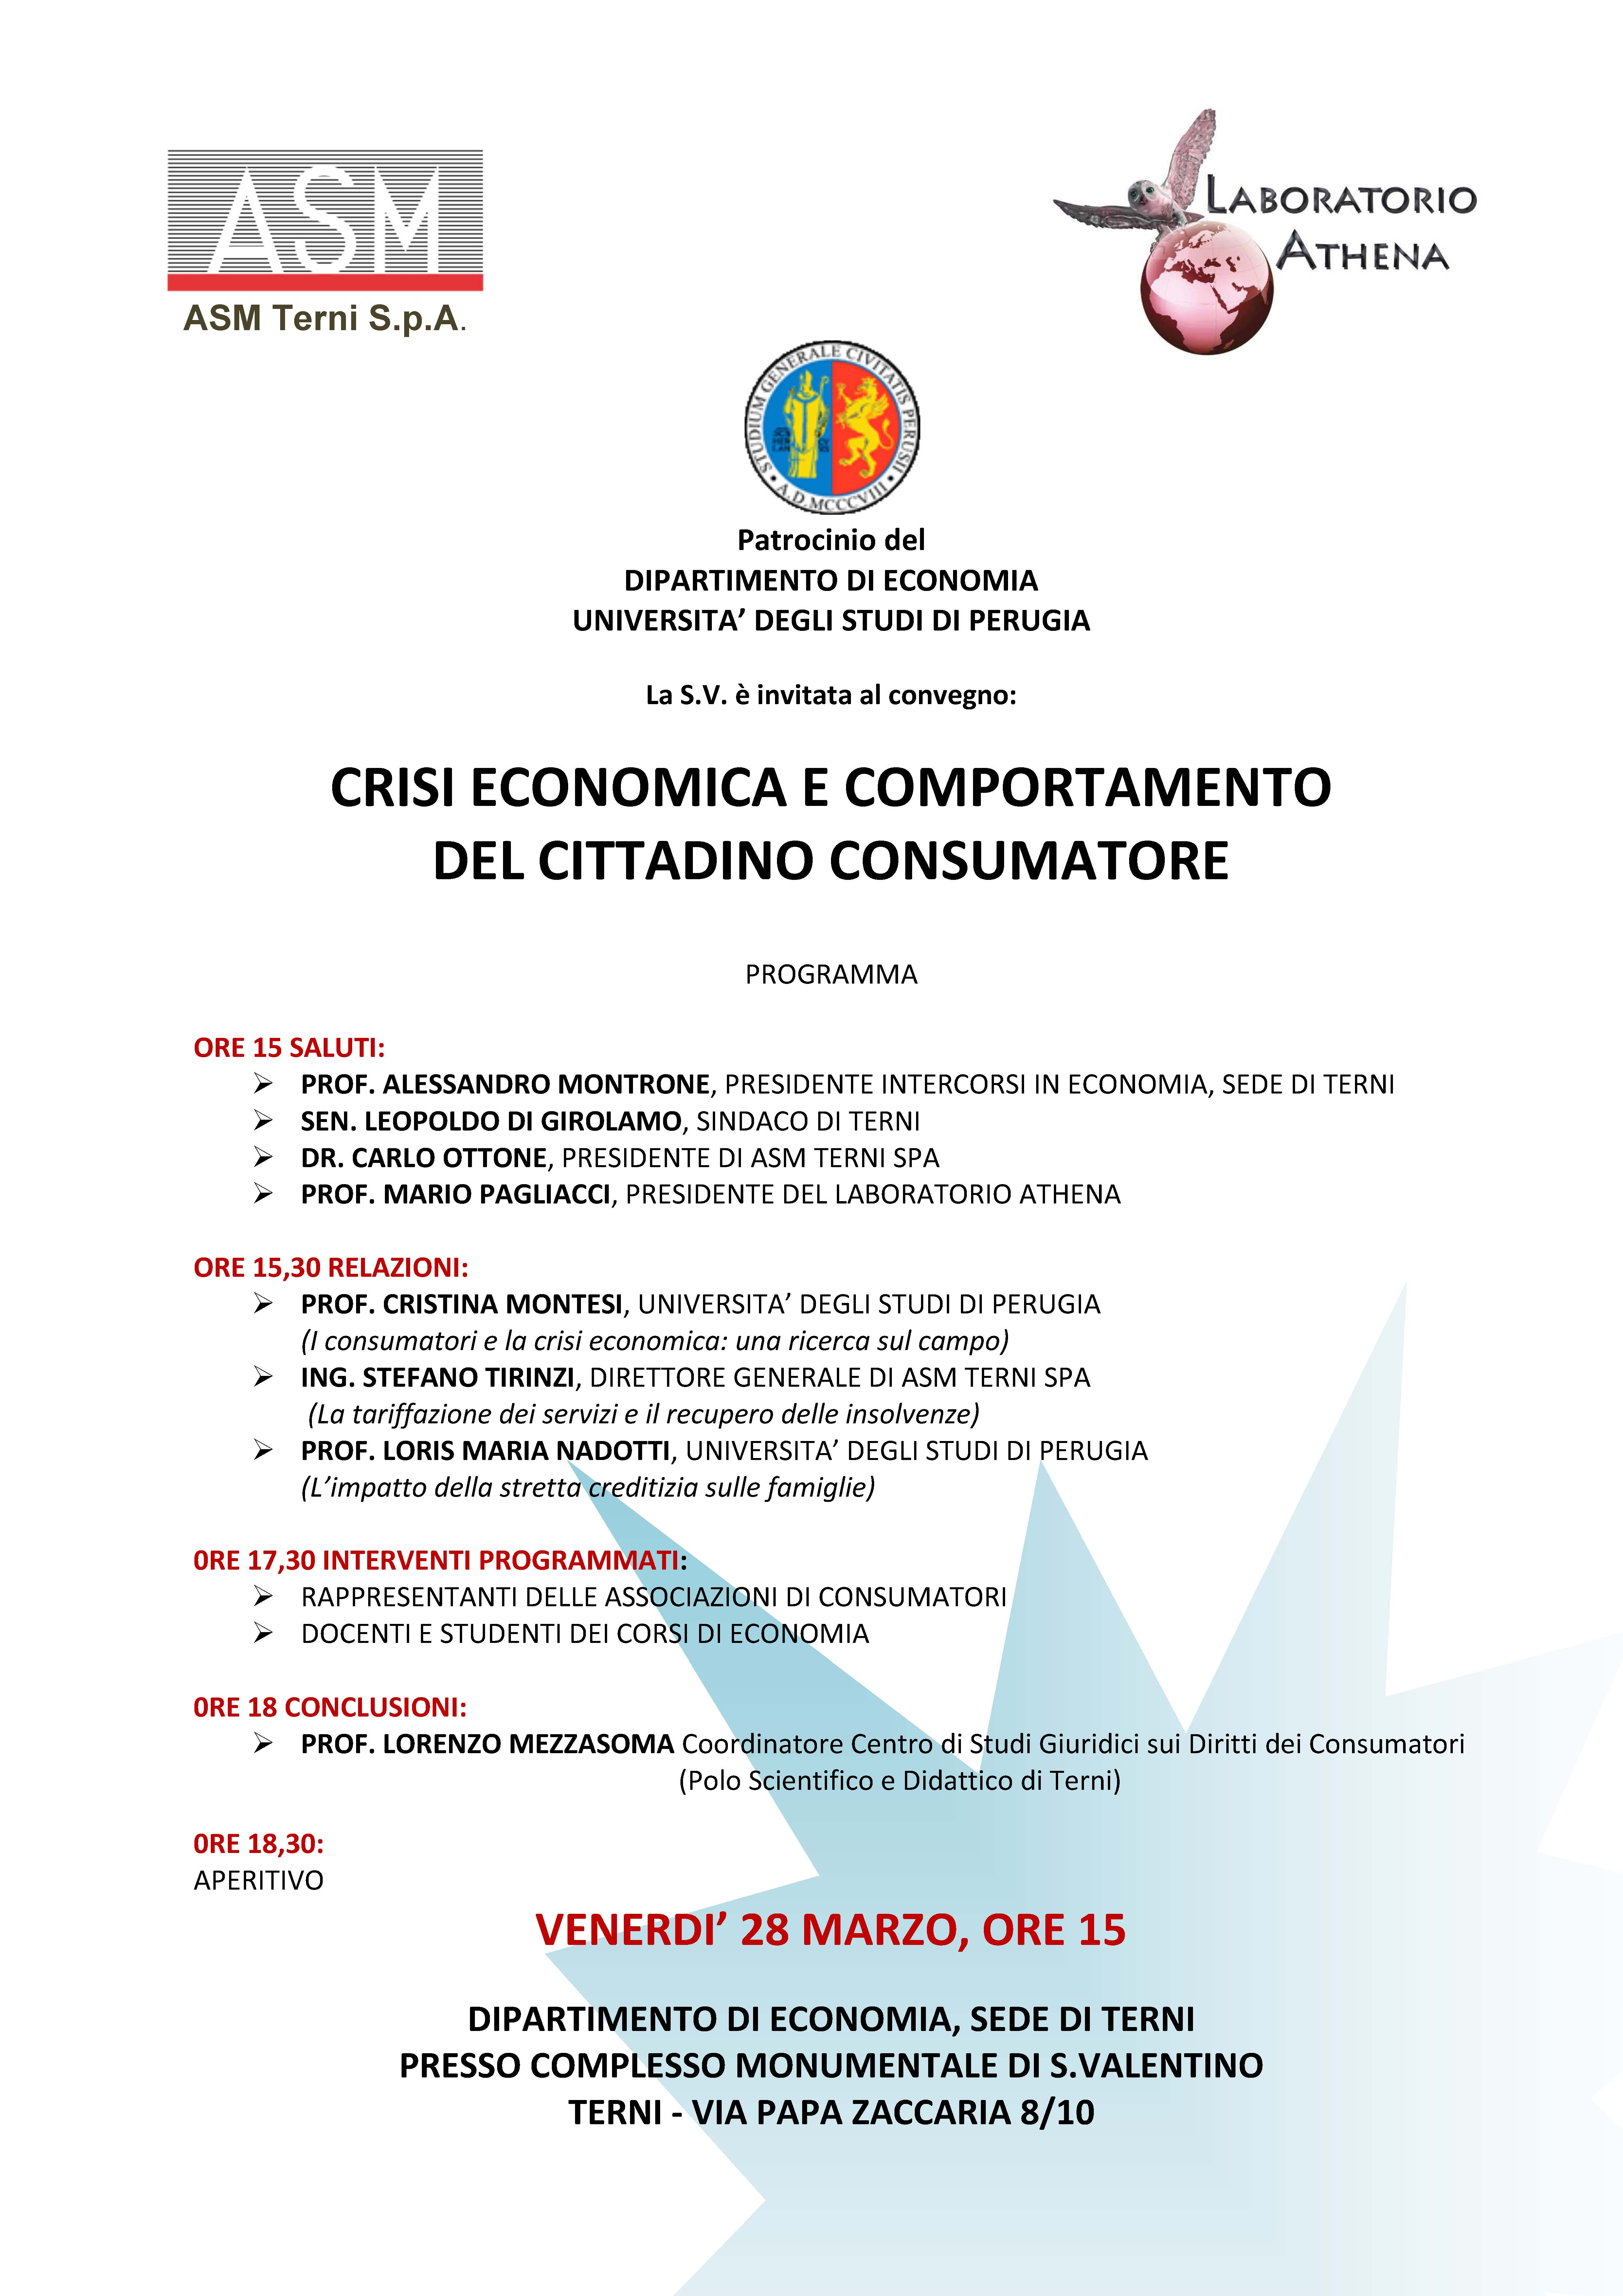 Convegno_20140328_locandina